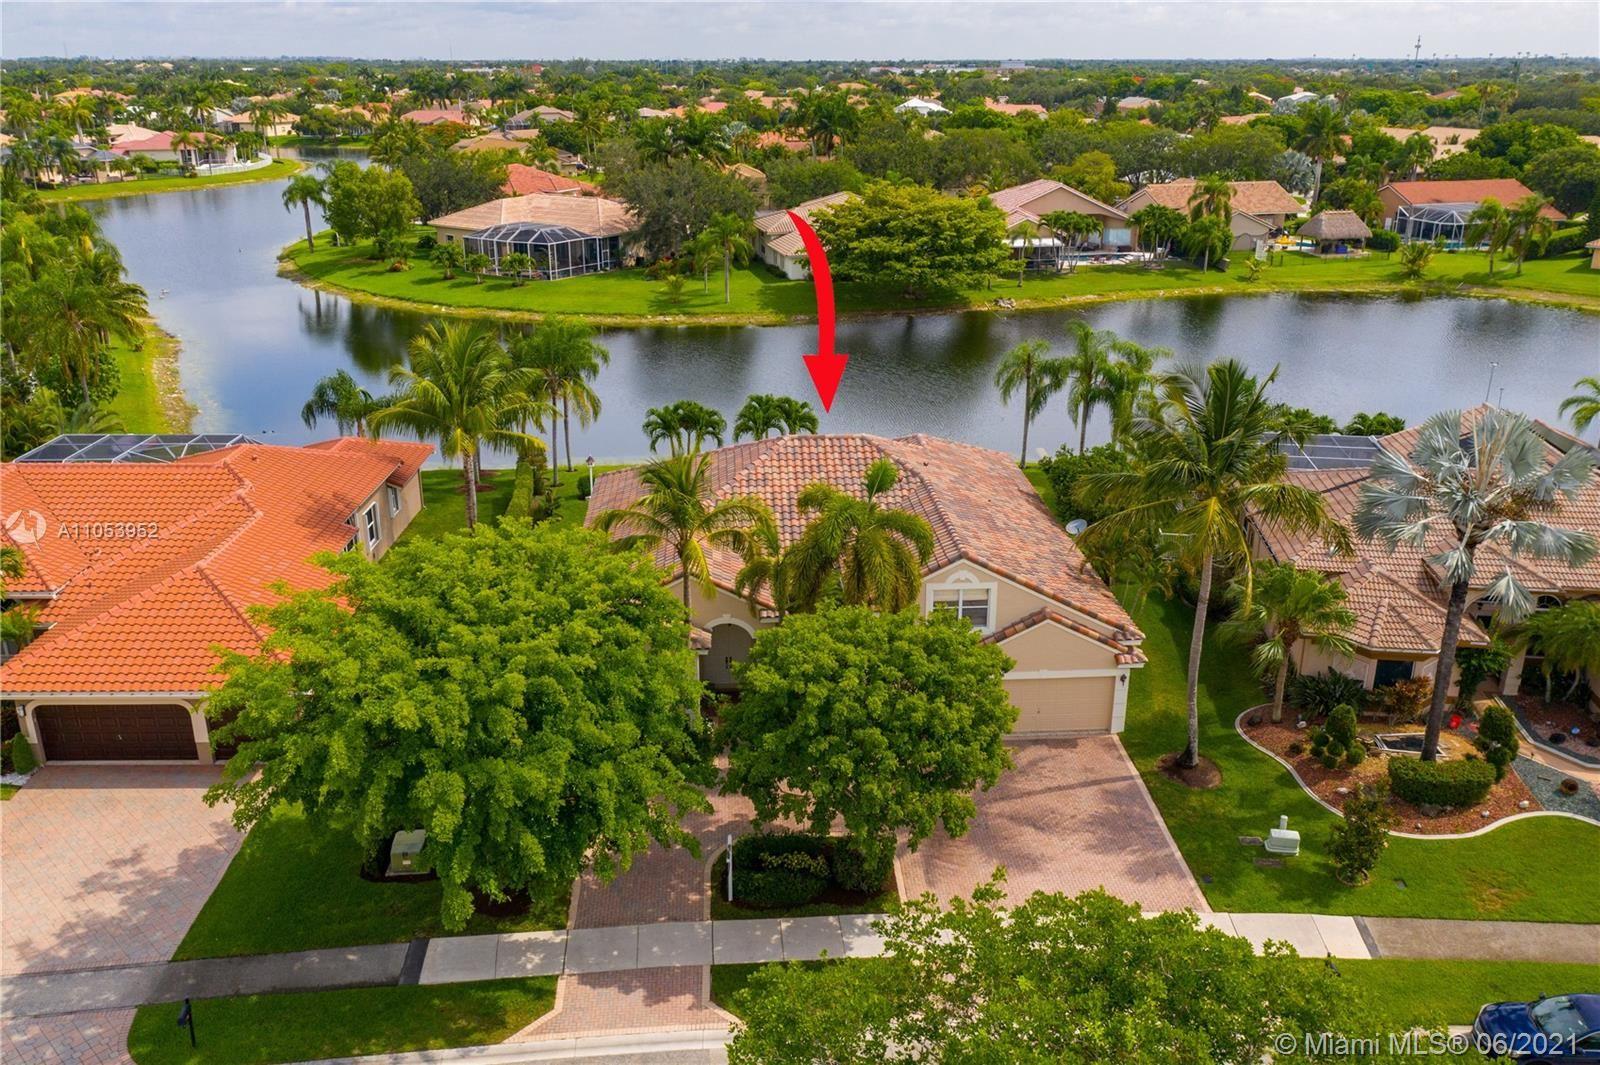 5213 Kensington Cir, Coral Springs, FL 33076 - #: A11053952